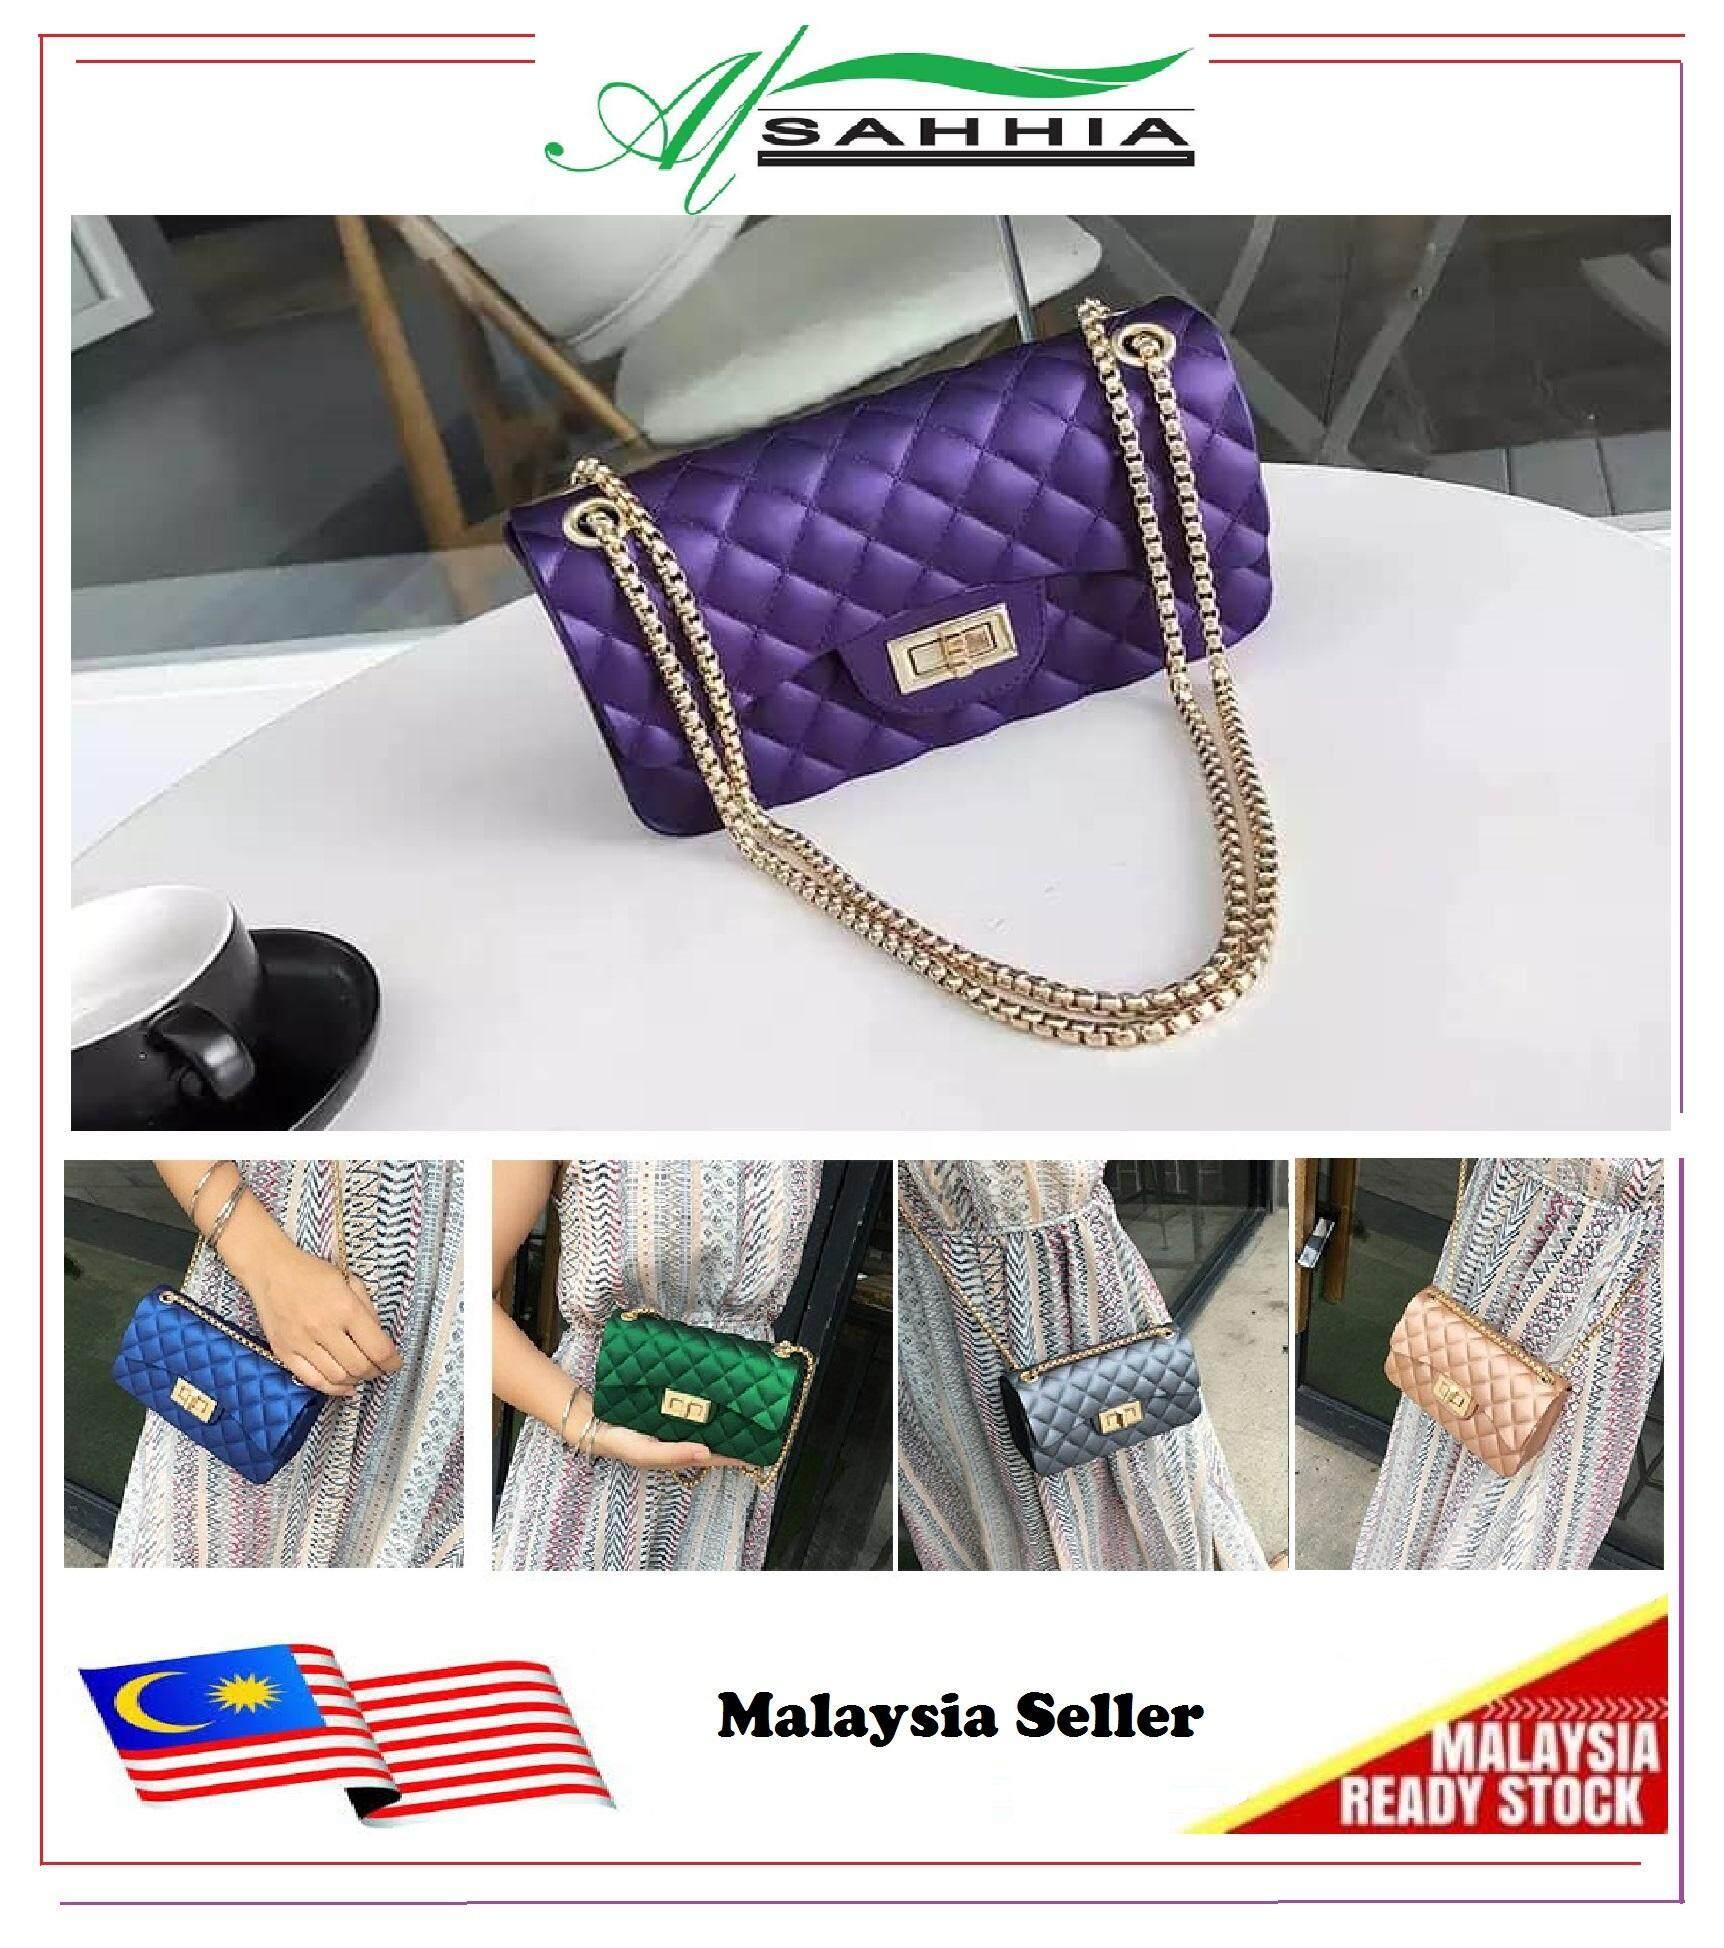 d9c38a4b48 Al Sahhia Ready Stock Jelly Bag Glory Bags Sling Bag Shoulder Bag Beg  Fashion Bags